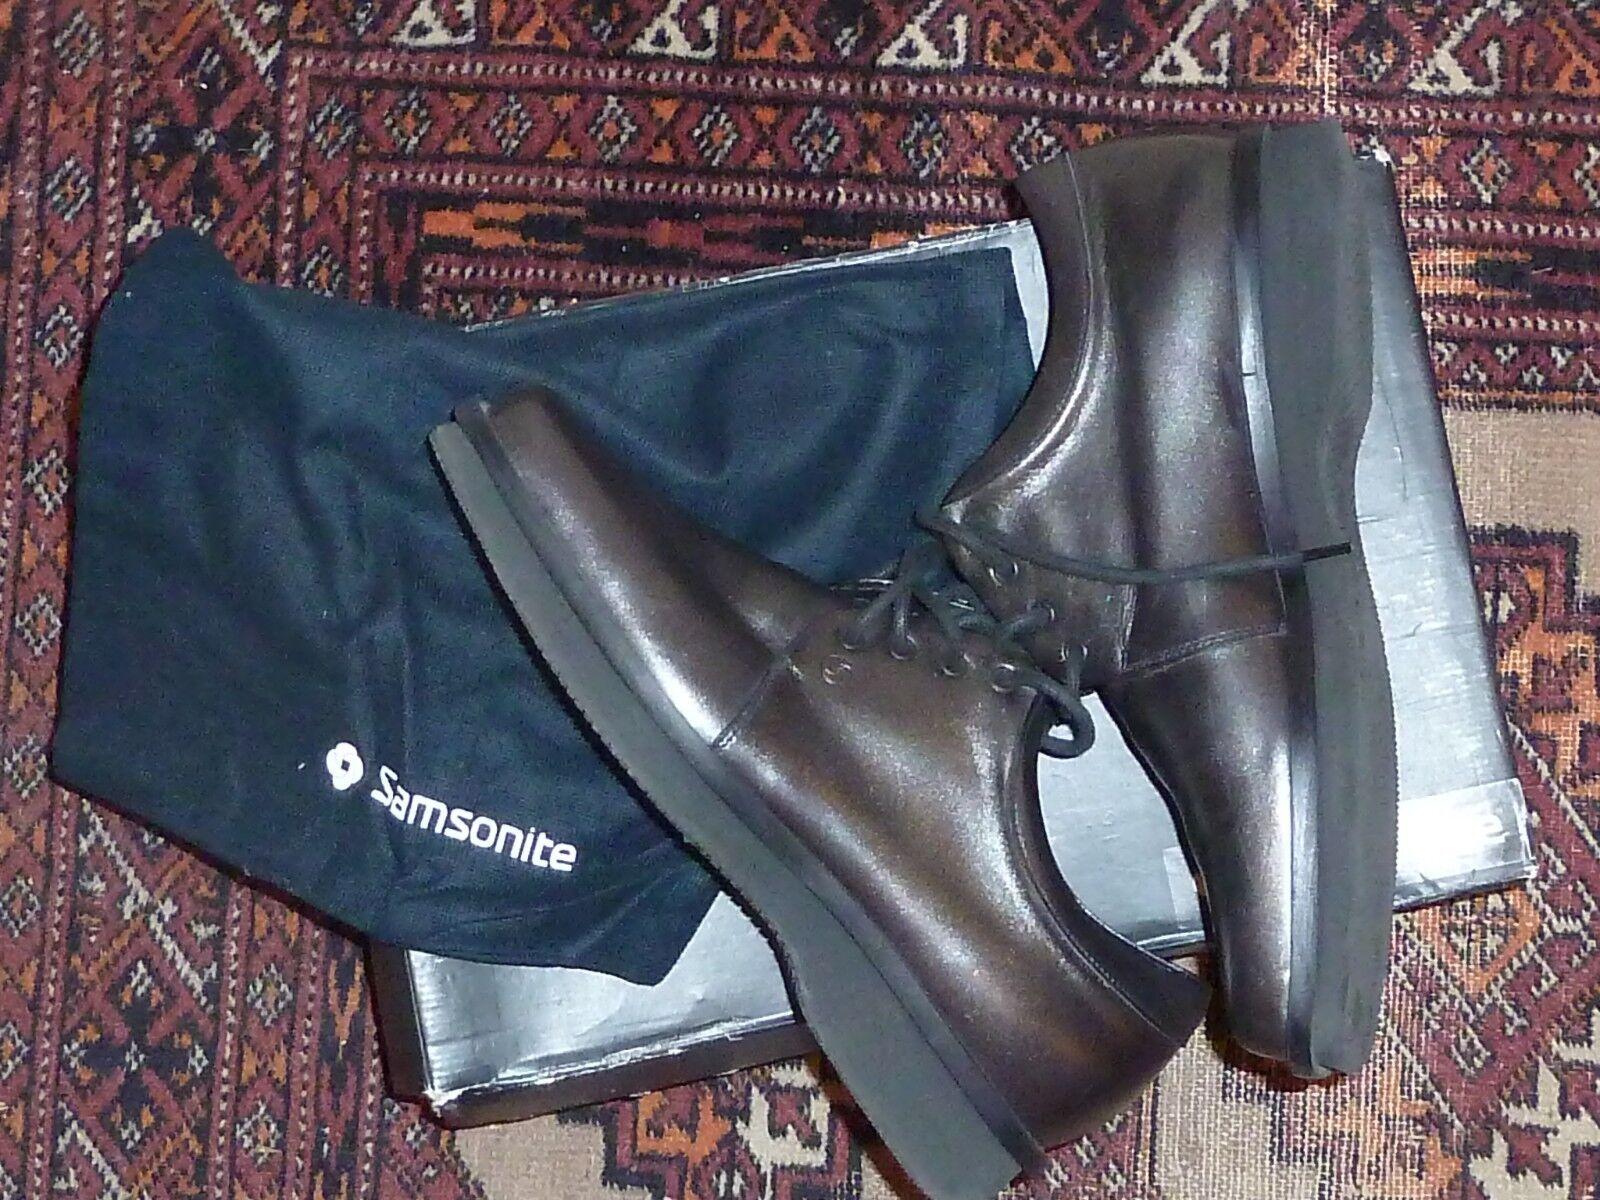 SAMSONITE zapatos zapatos zapatos mujer 37,5 NUOVE  comprar barato